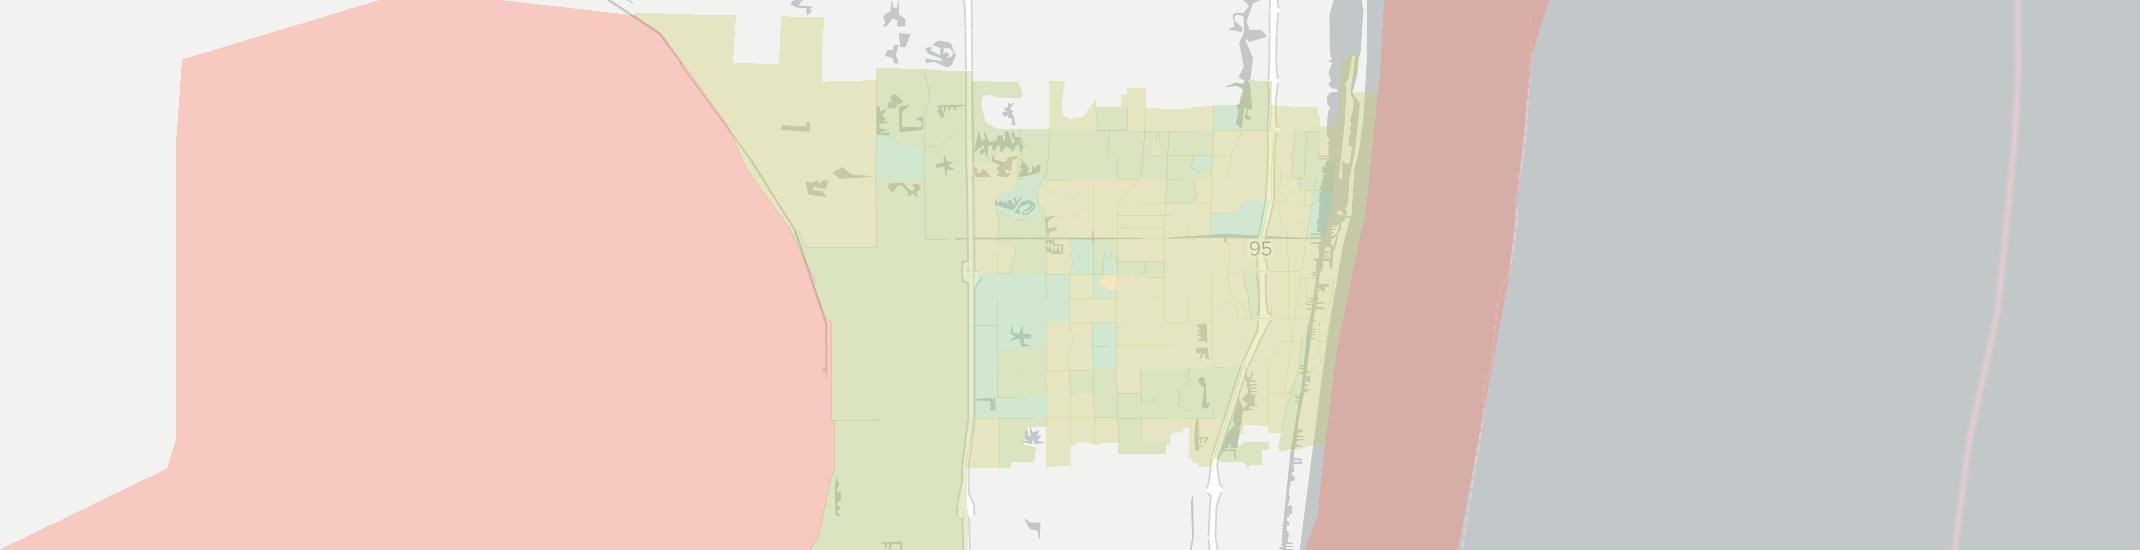 Boynton Beach Internet Competition Map. Click for interactive map.